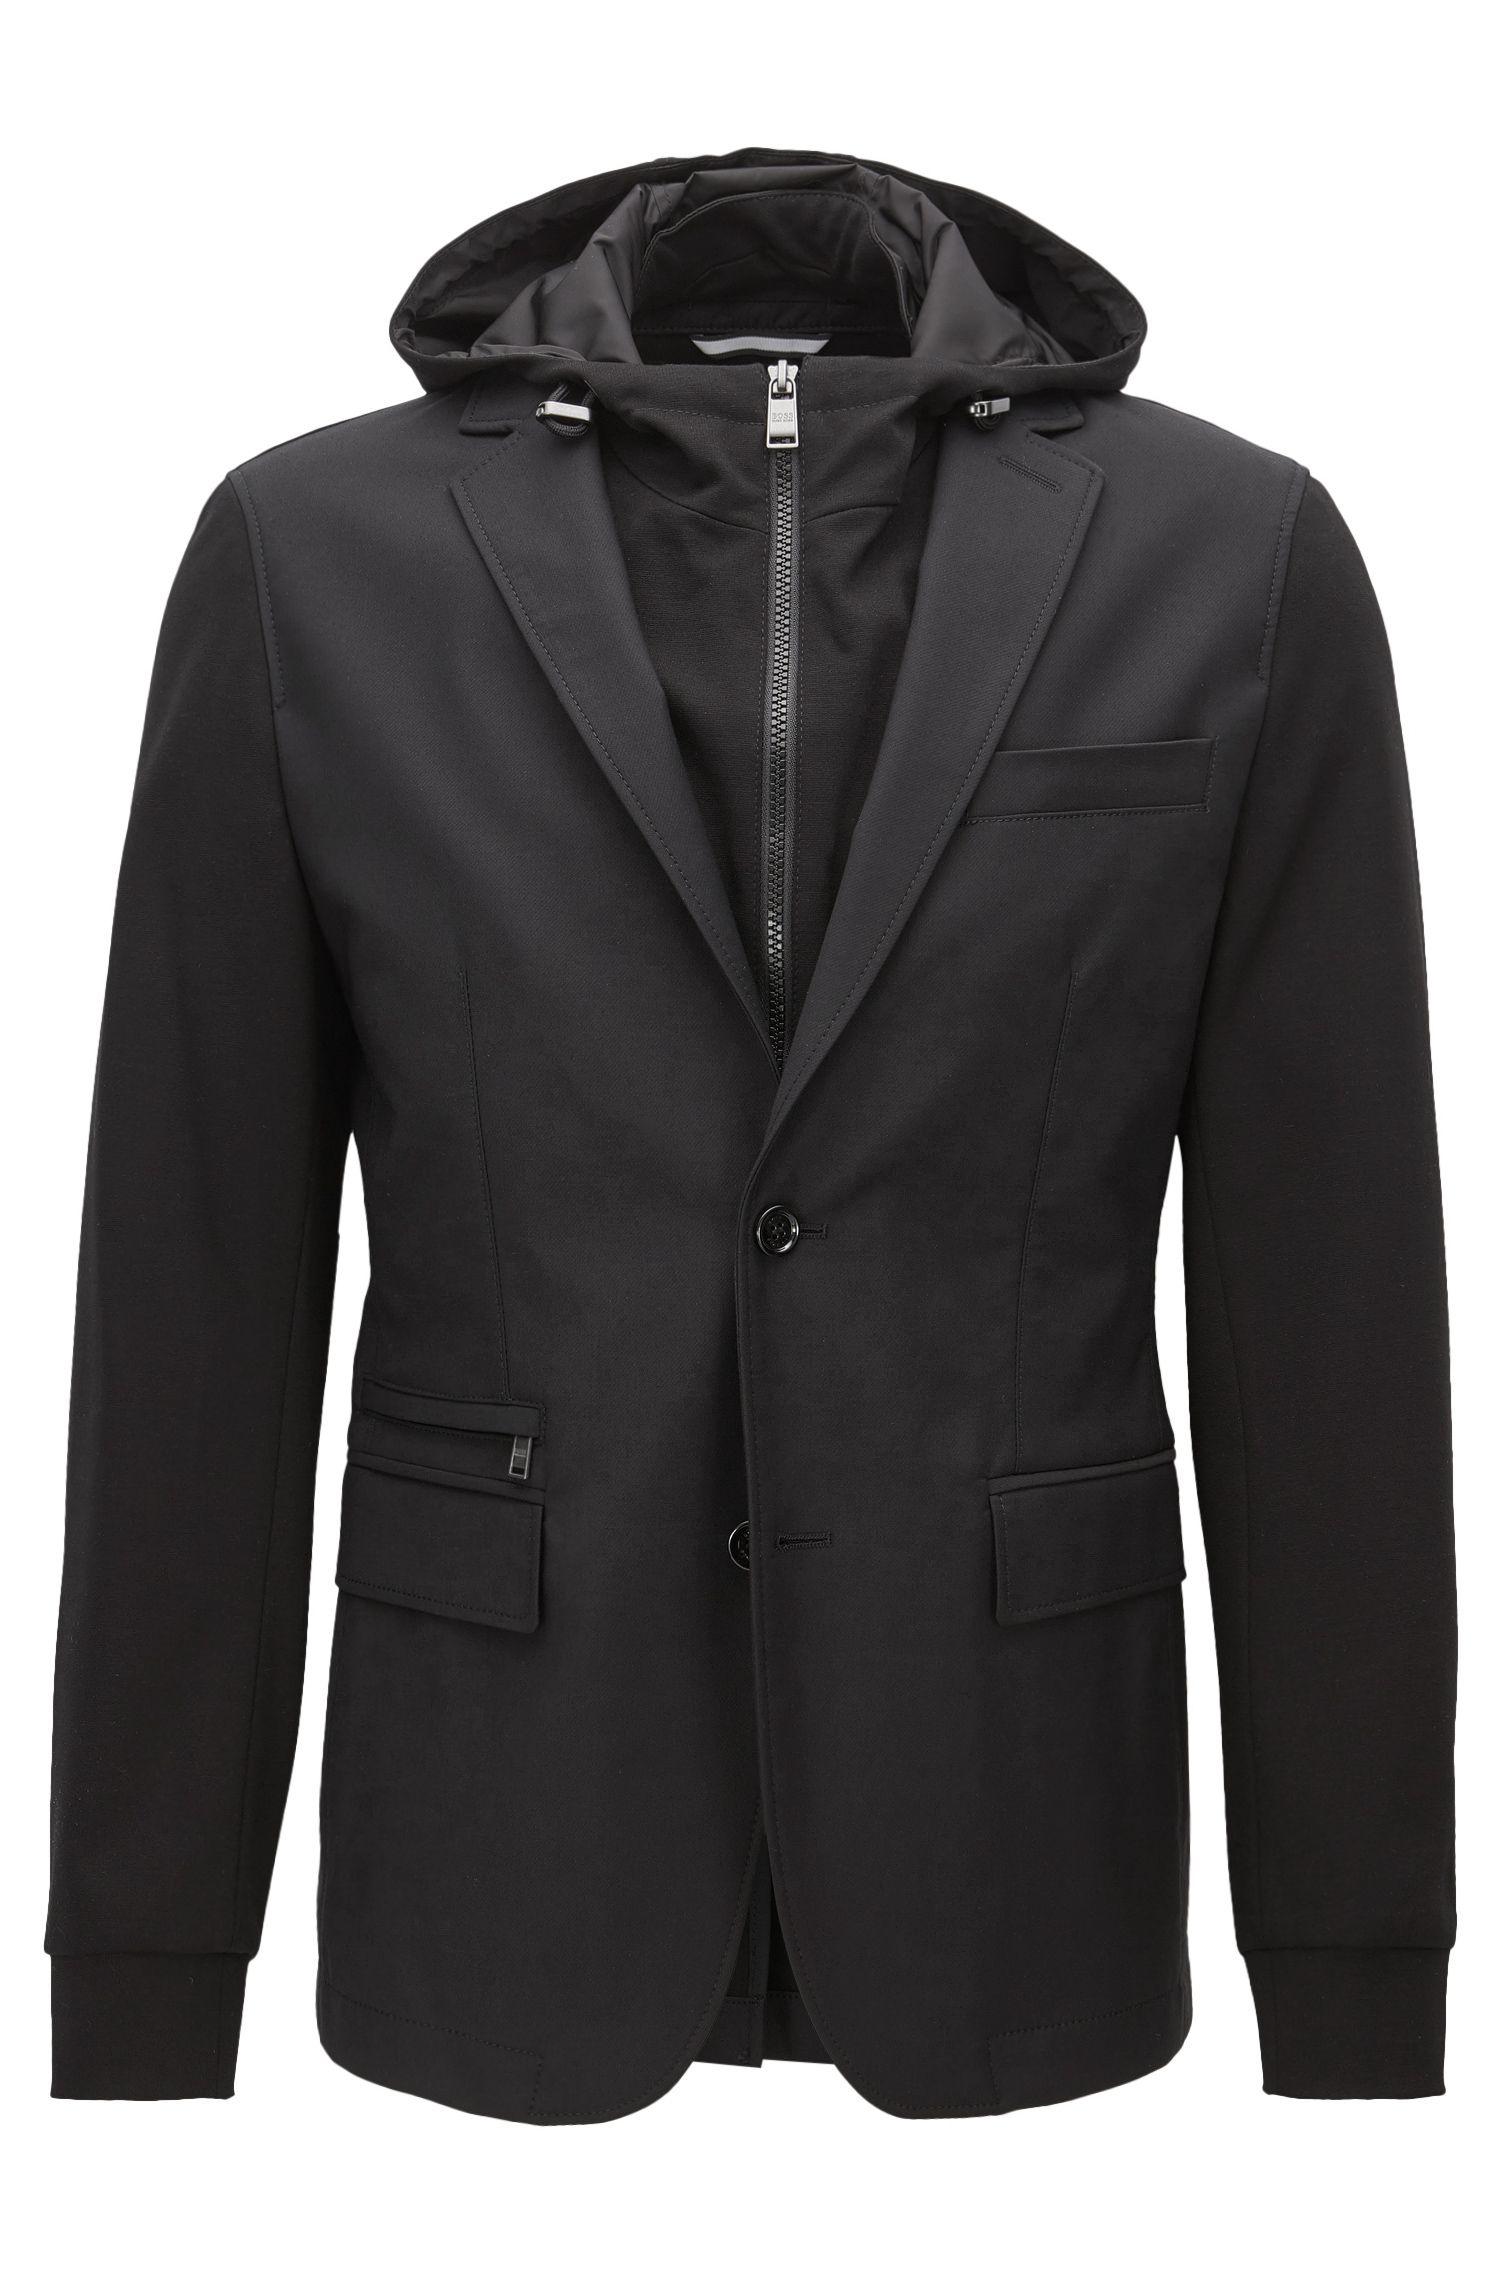 Cotton Blend 2-in-1 Sport Coat, Slim Fit | Nenzo, Black